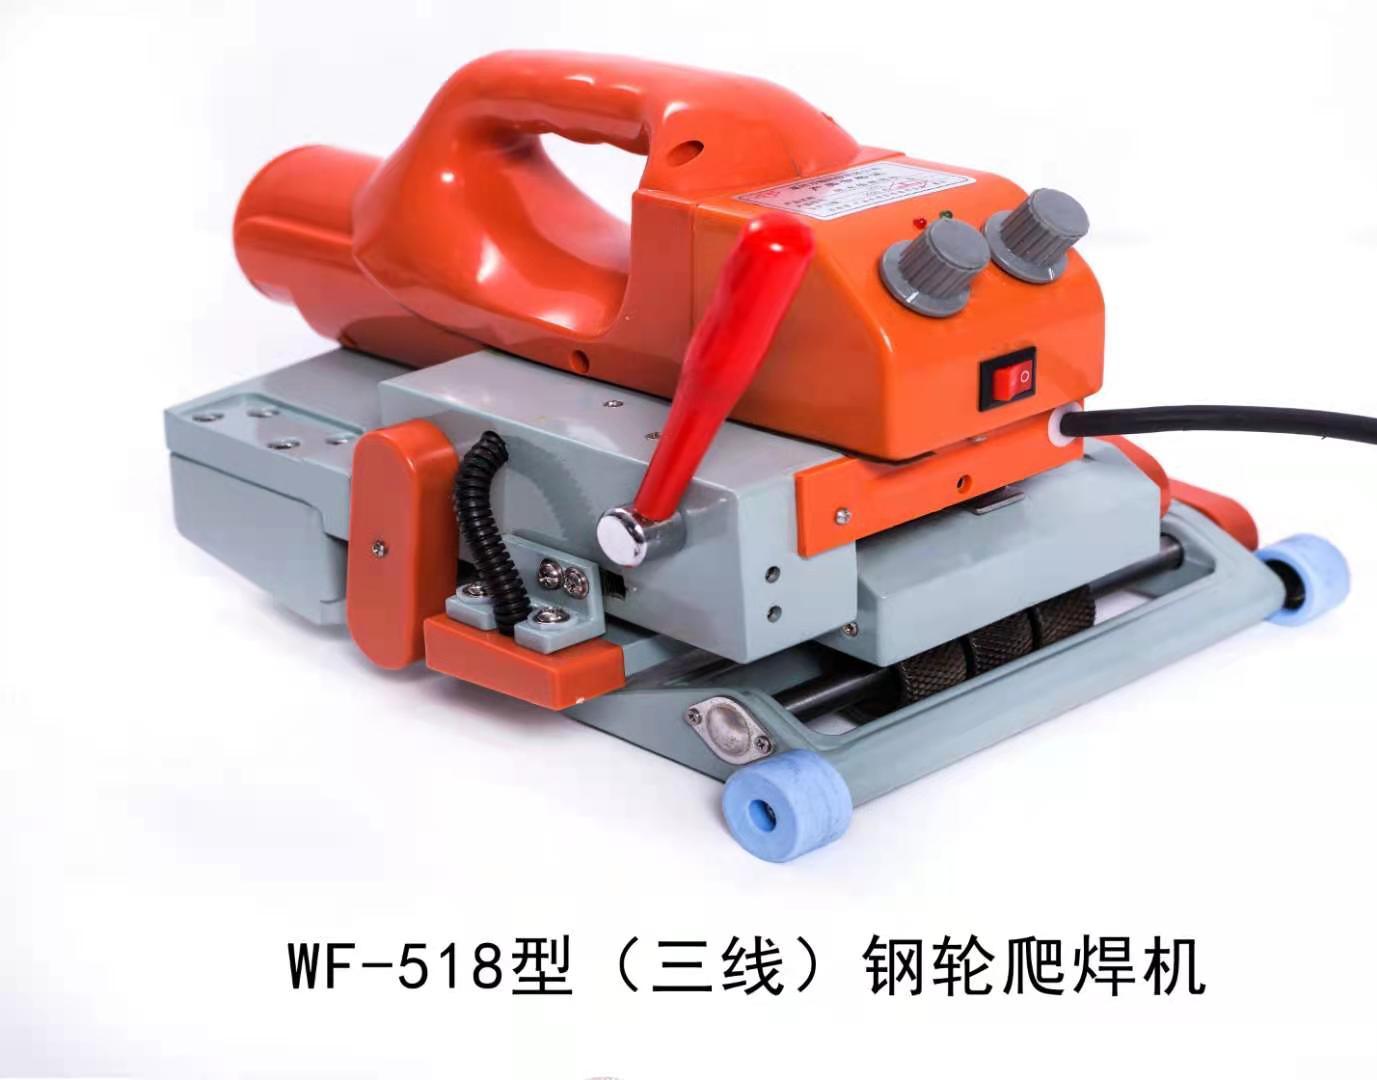 WF-518三线型爬焊机